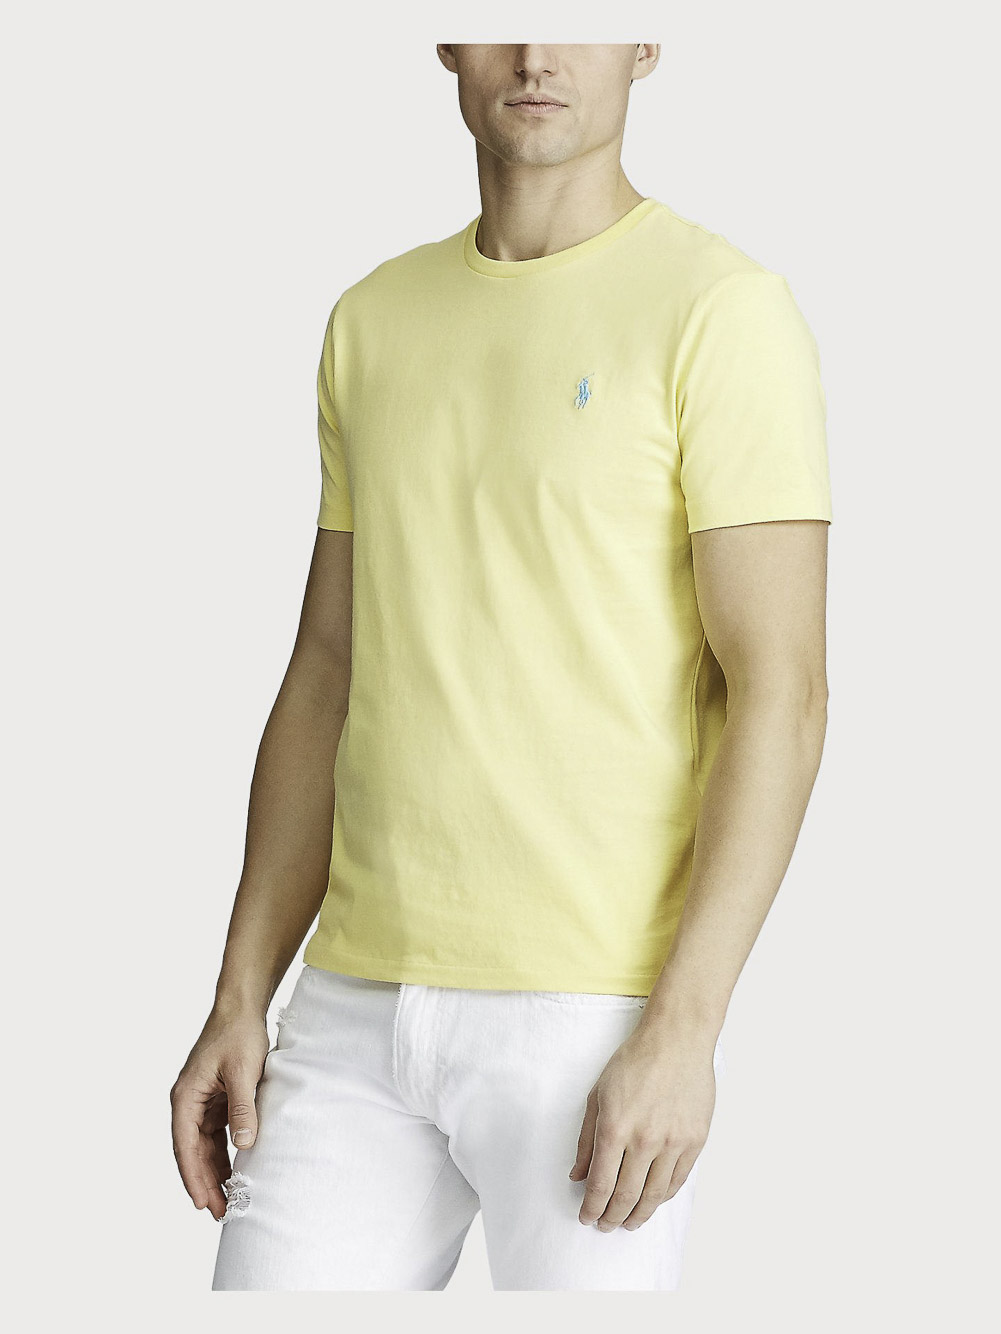 POLO RALPH LAUREN Μπλούζα T-Shirt 710671438147 ΚΙΤΡΙΝΟ